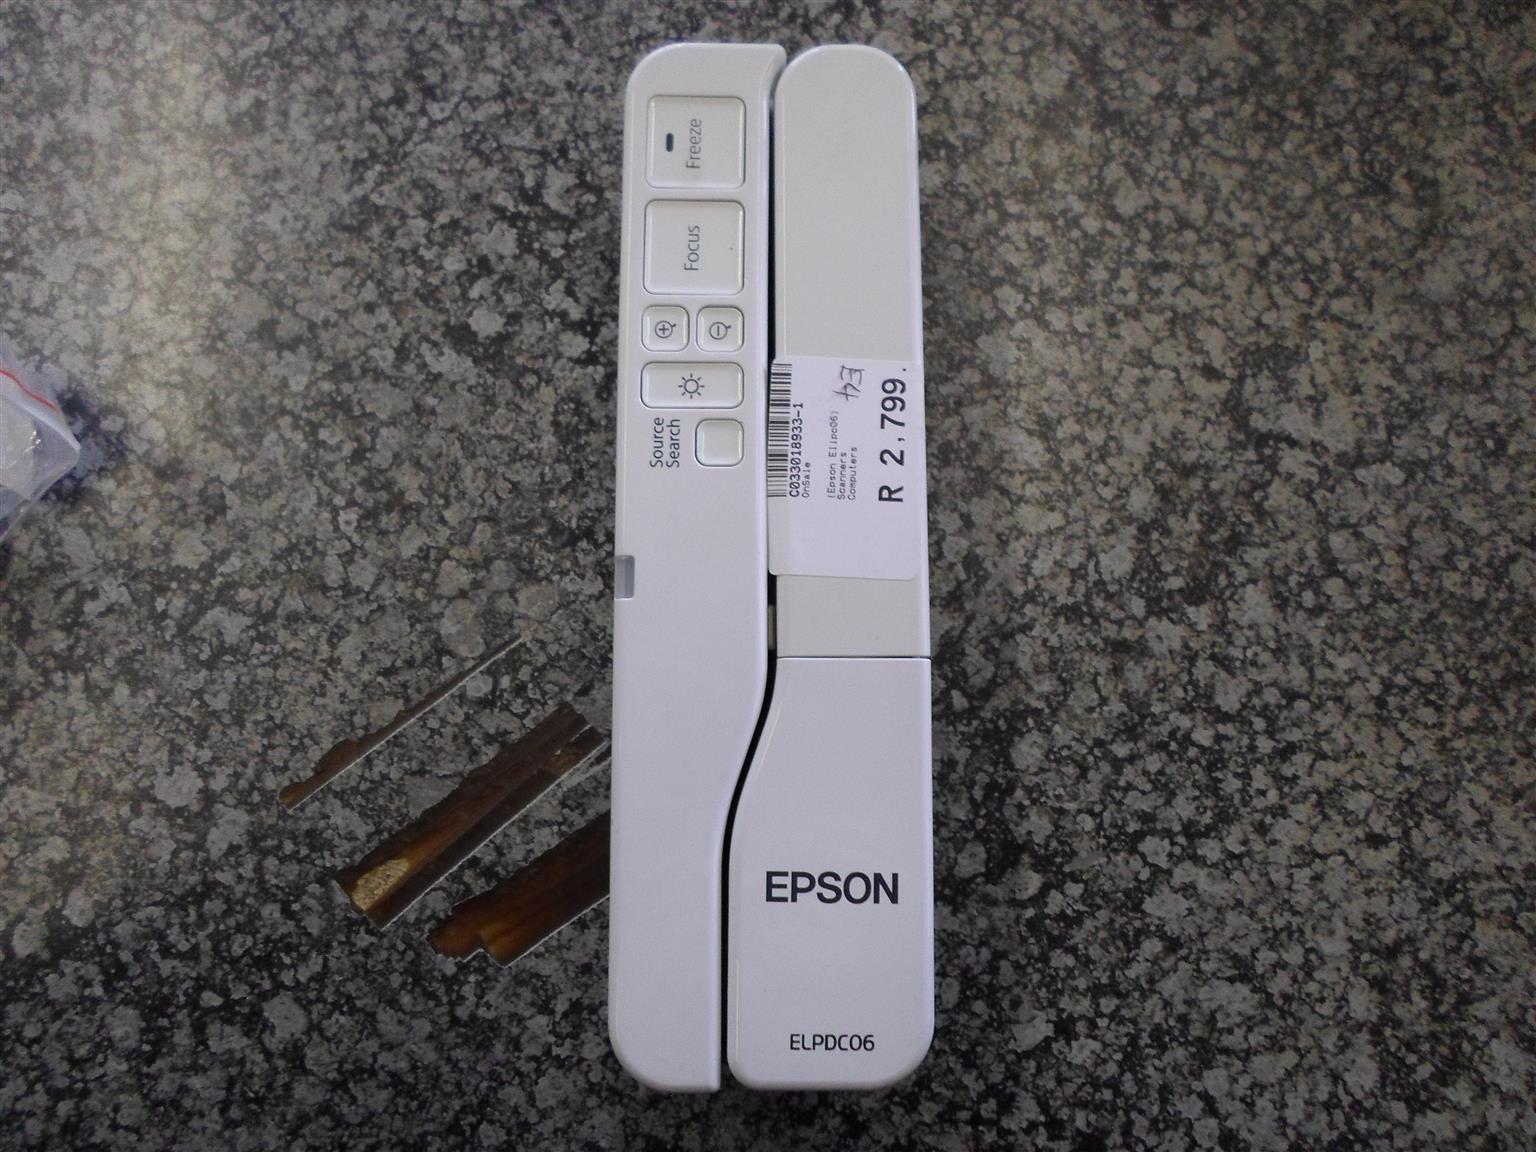 Epson ELPDC06 Document Camera / Scanner